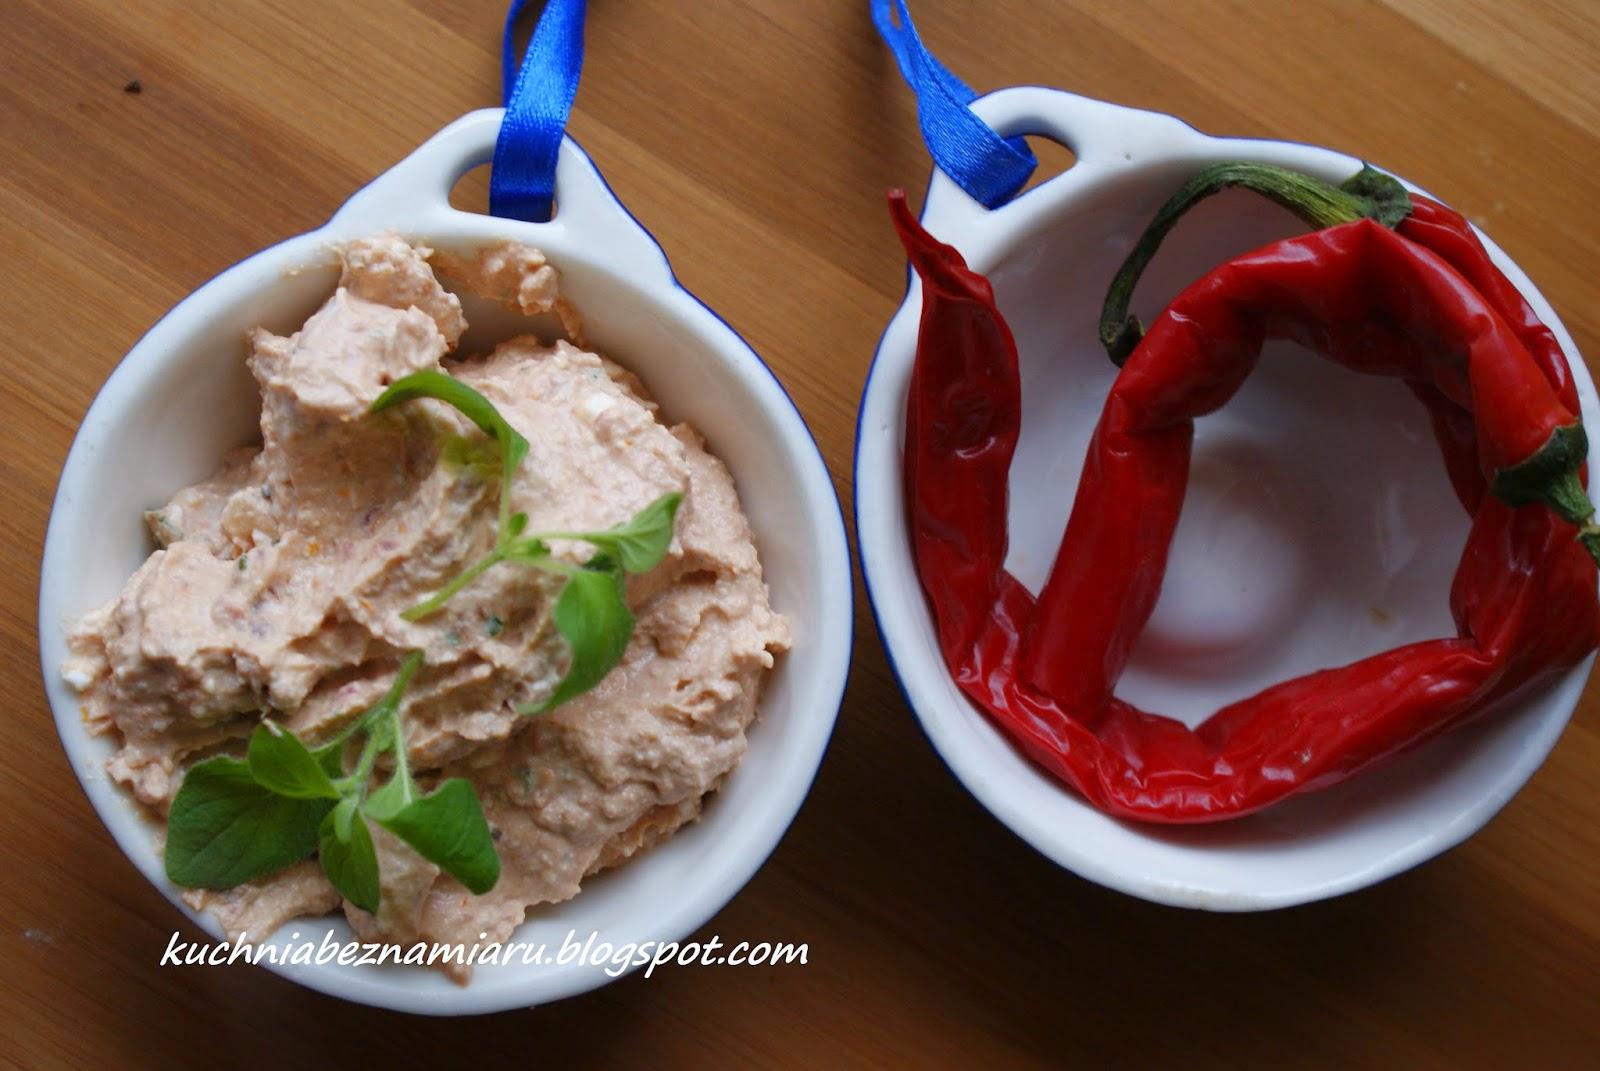 http://kuchniabeznamiaru.blogspot.com/2015/02/pikantna-pasta-z-suszonymi-pomidorami.html